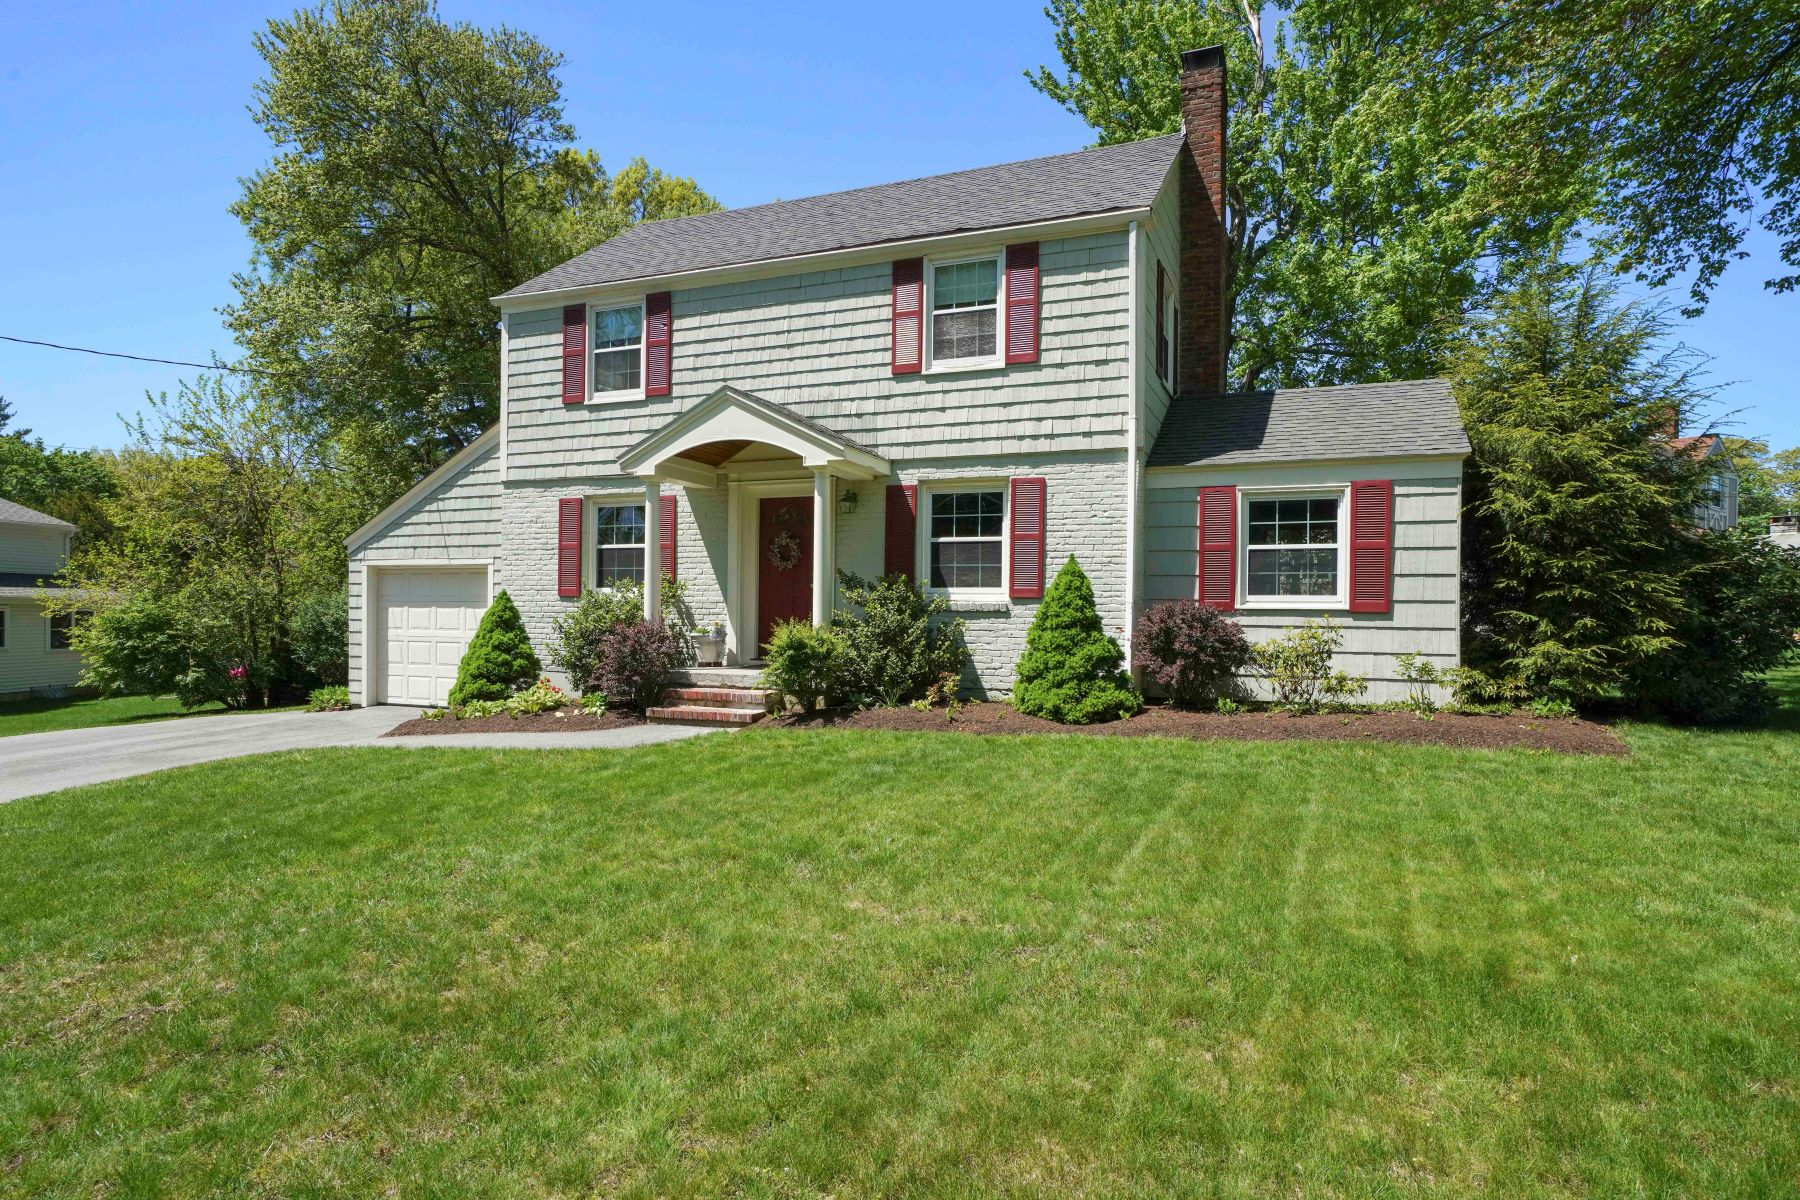 Single Family Homes for Sale at 26 Hampton Road 26 Hampton Rd, Natick, Massachusetts 01760 United States